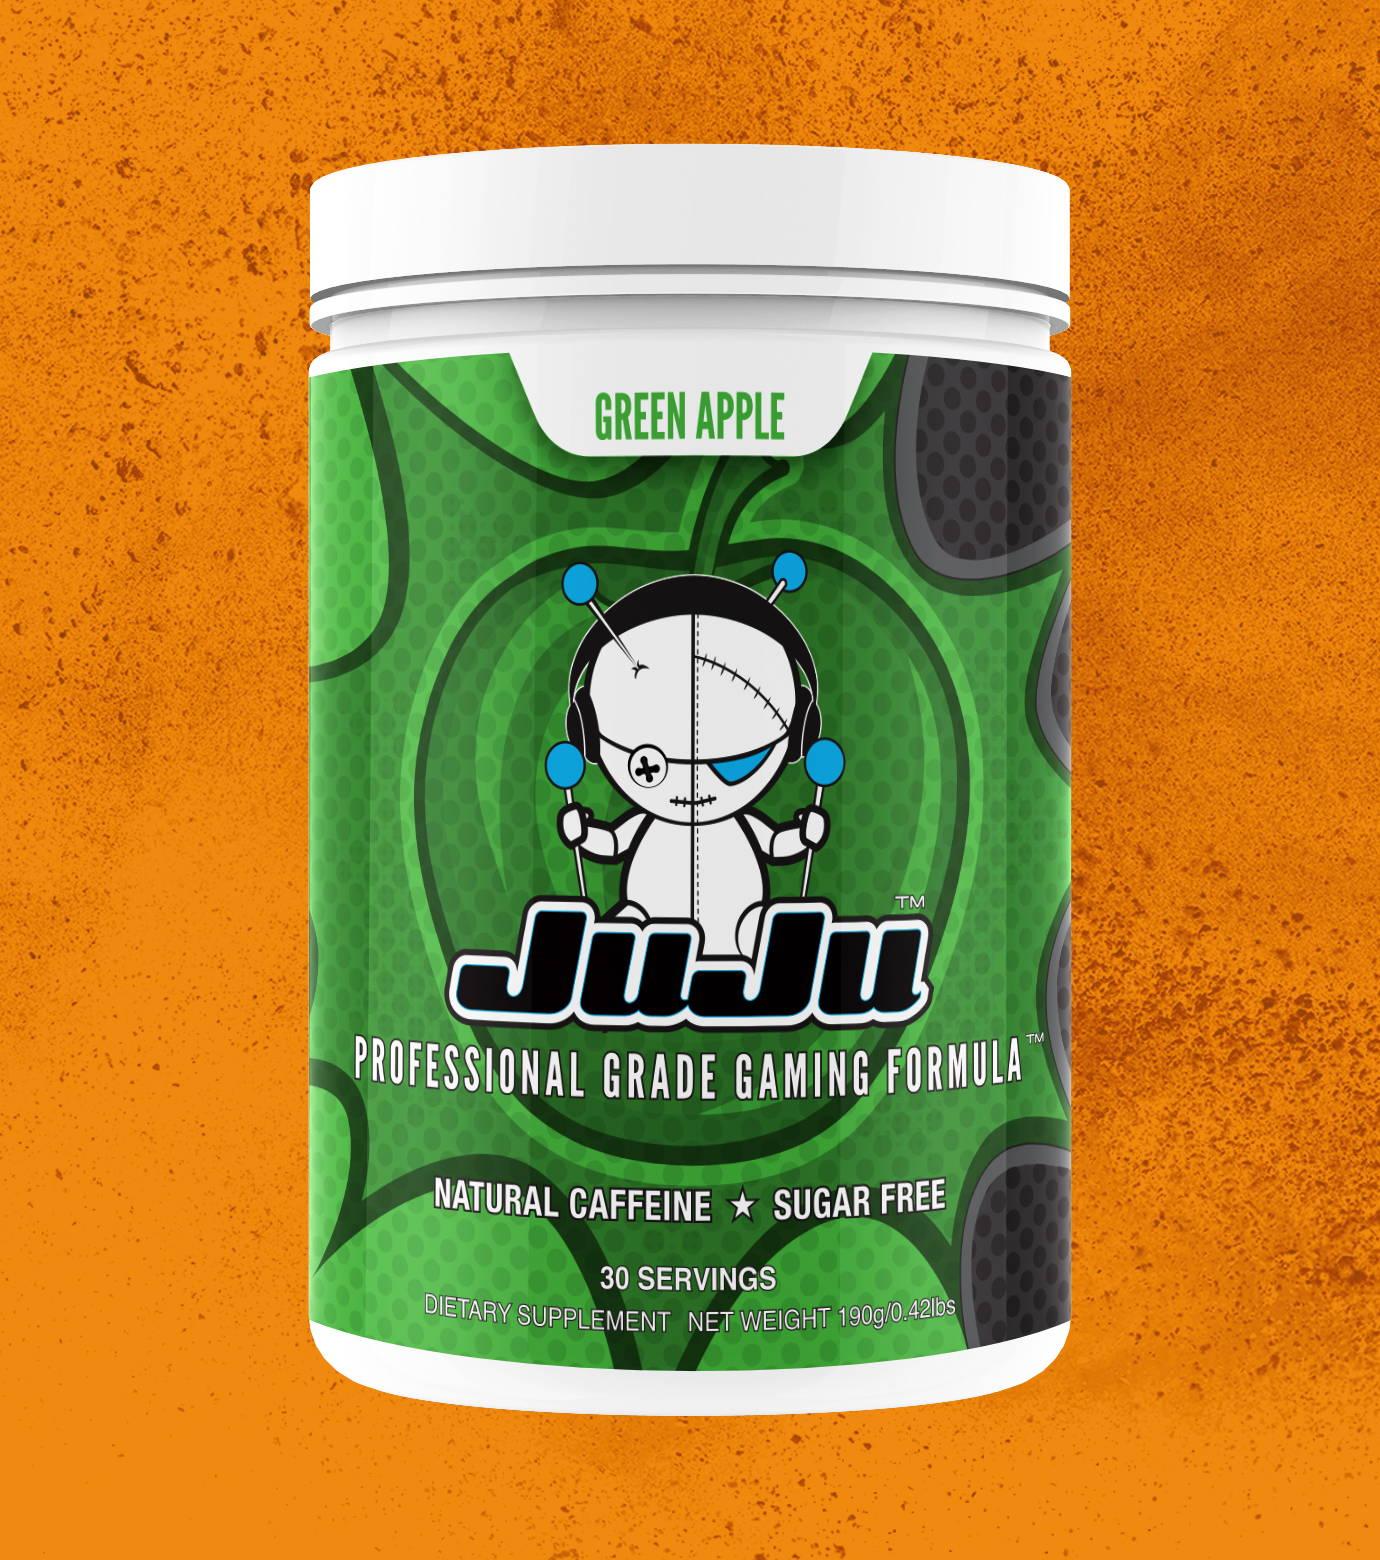 JuJu Green Apple Gaming Formula